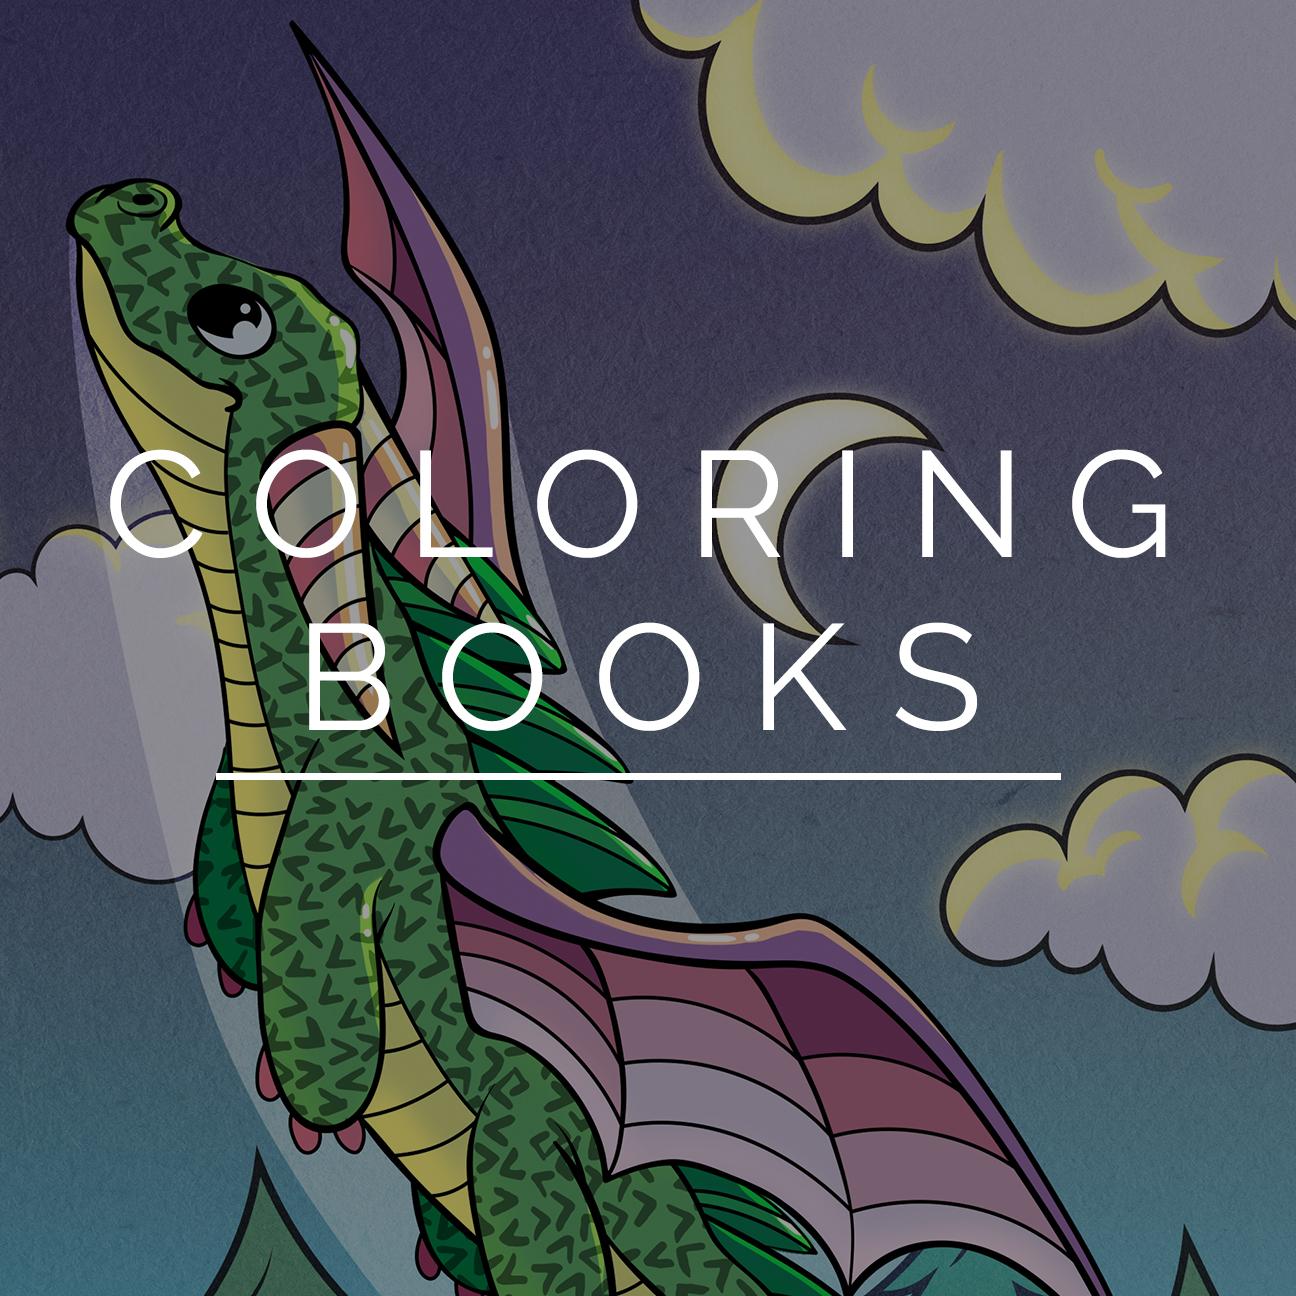 coloringbooks_thumb.jpg